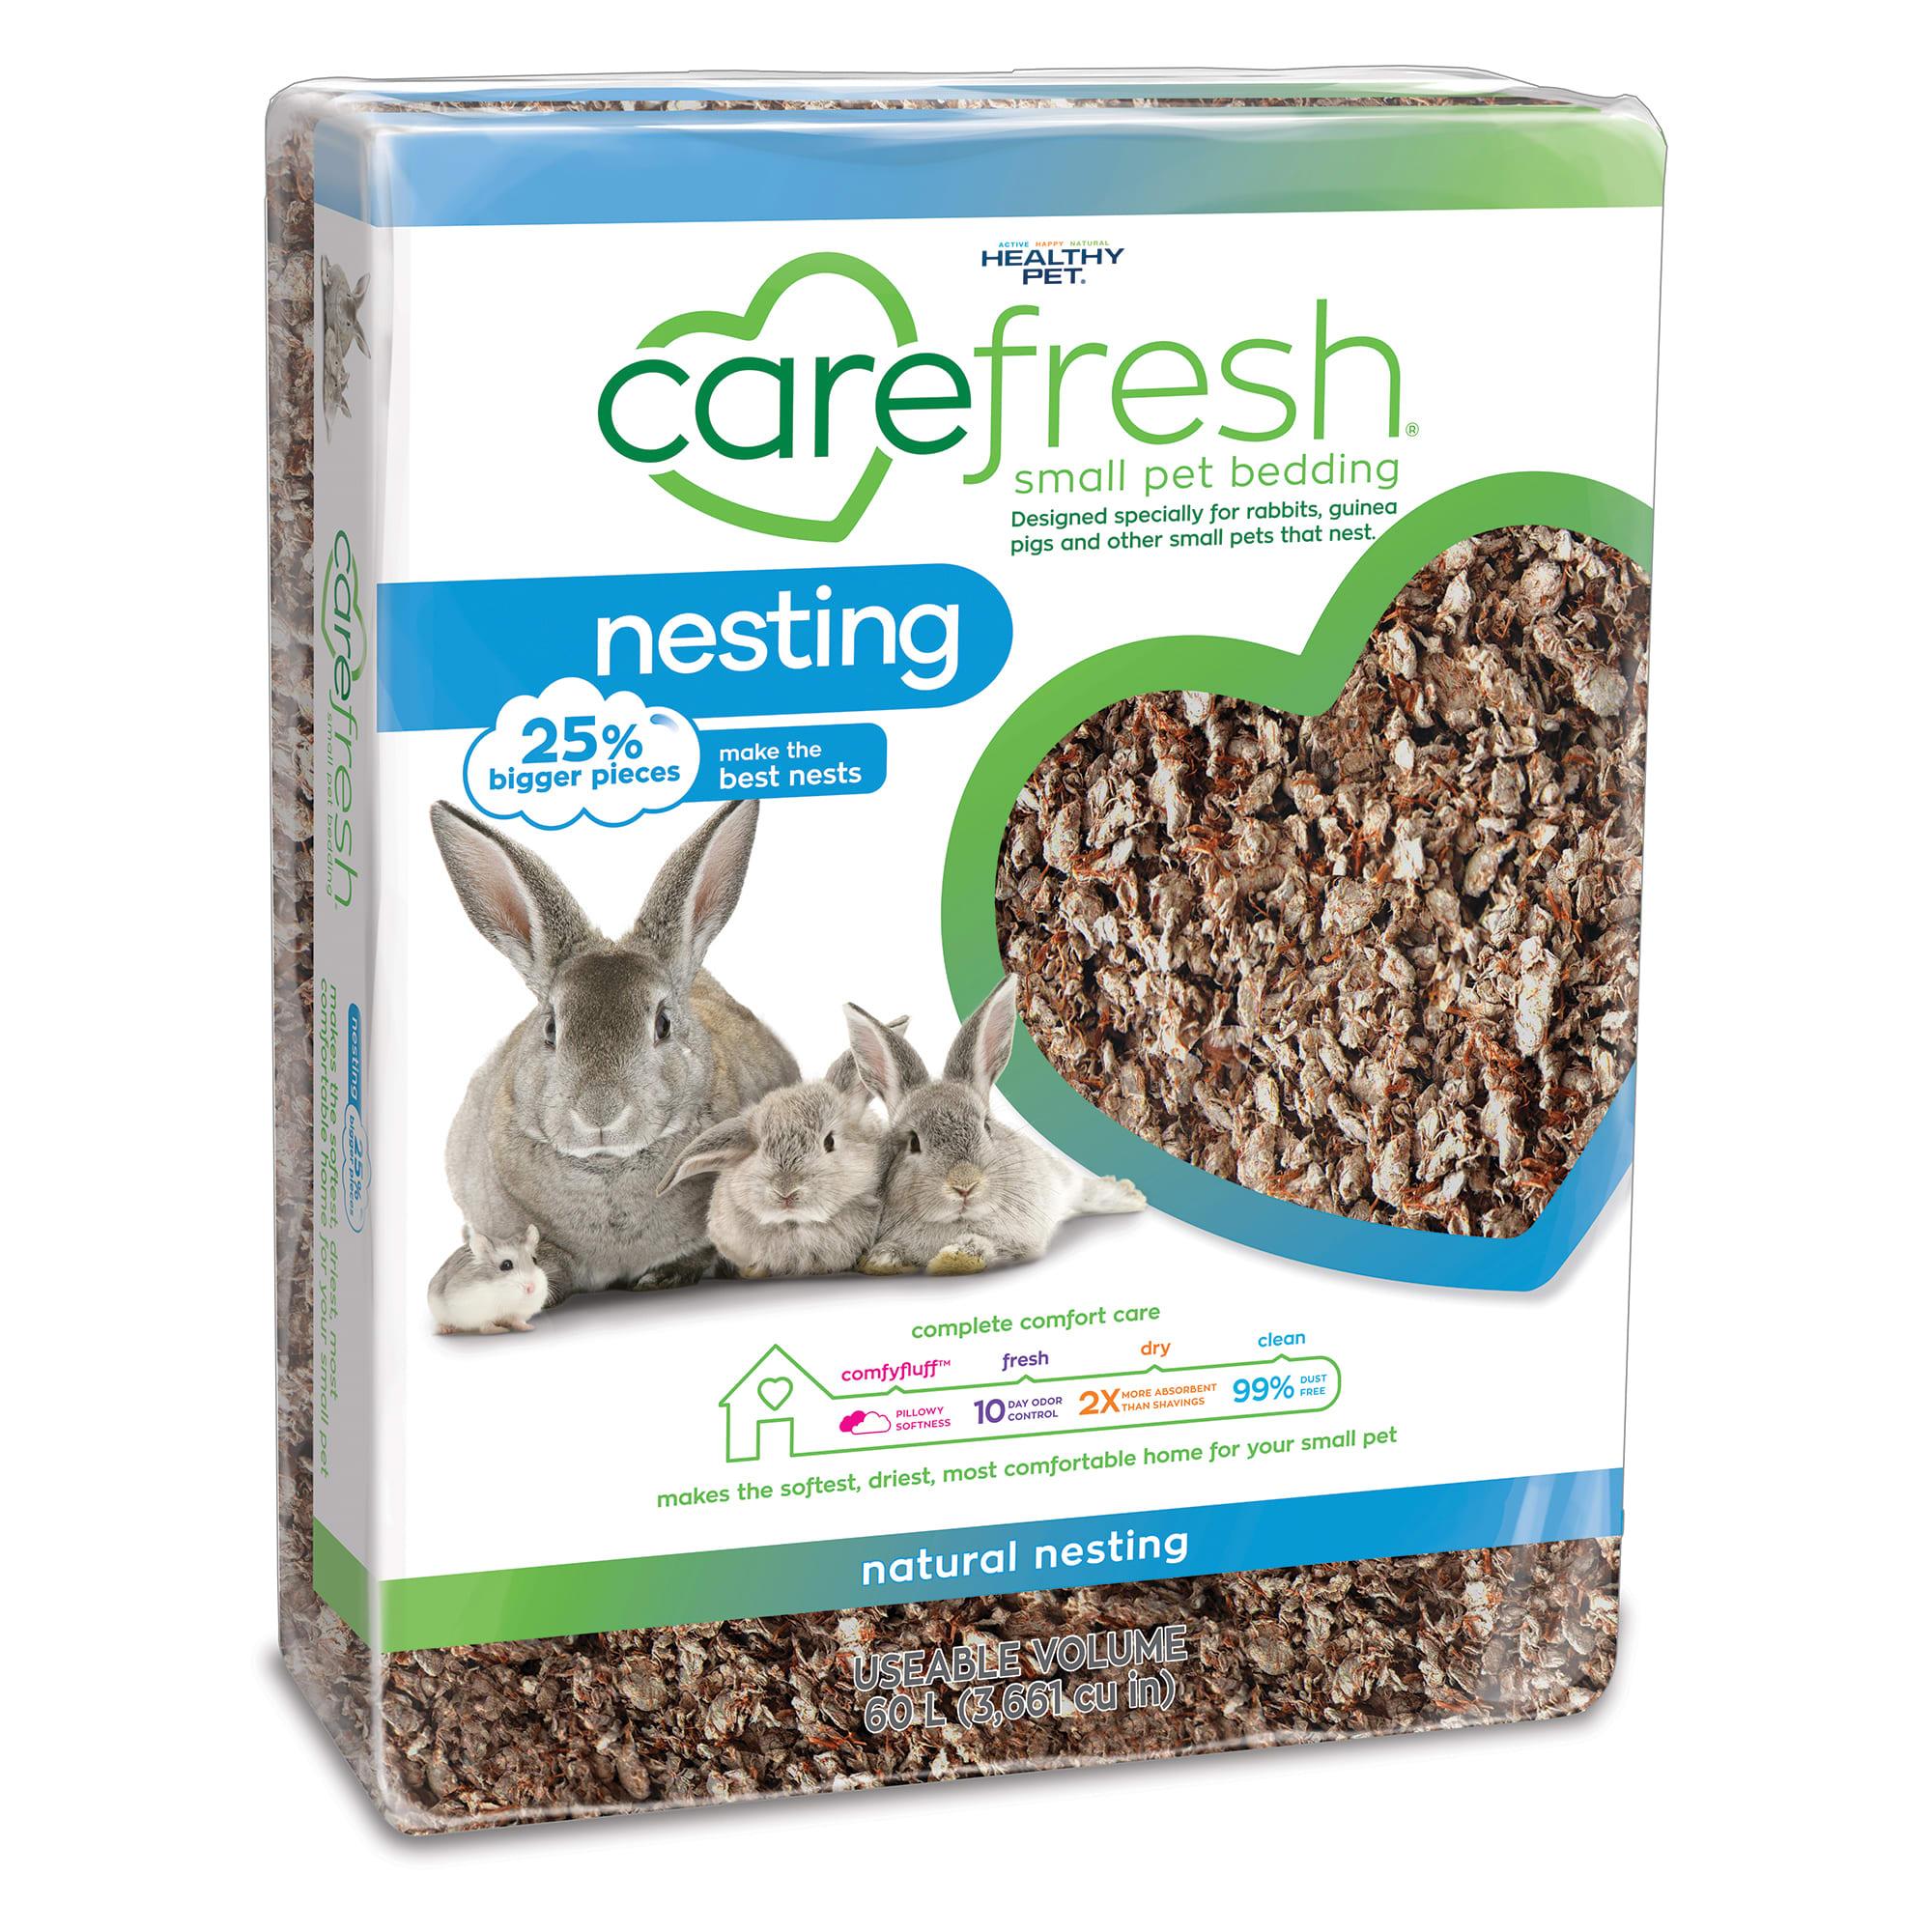 healthy pet carefresh